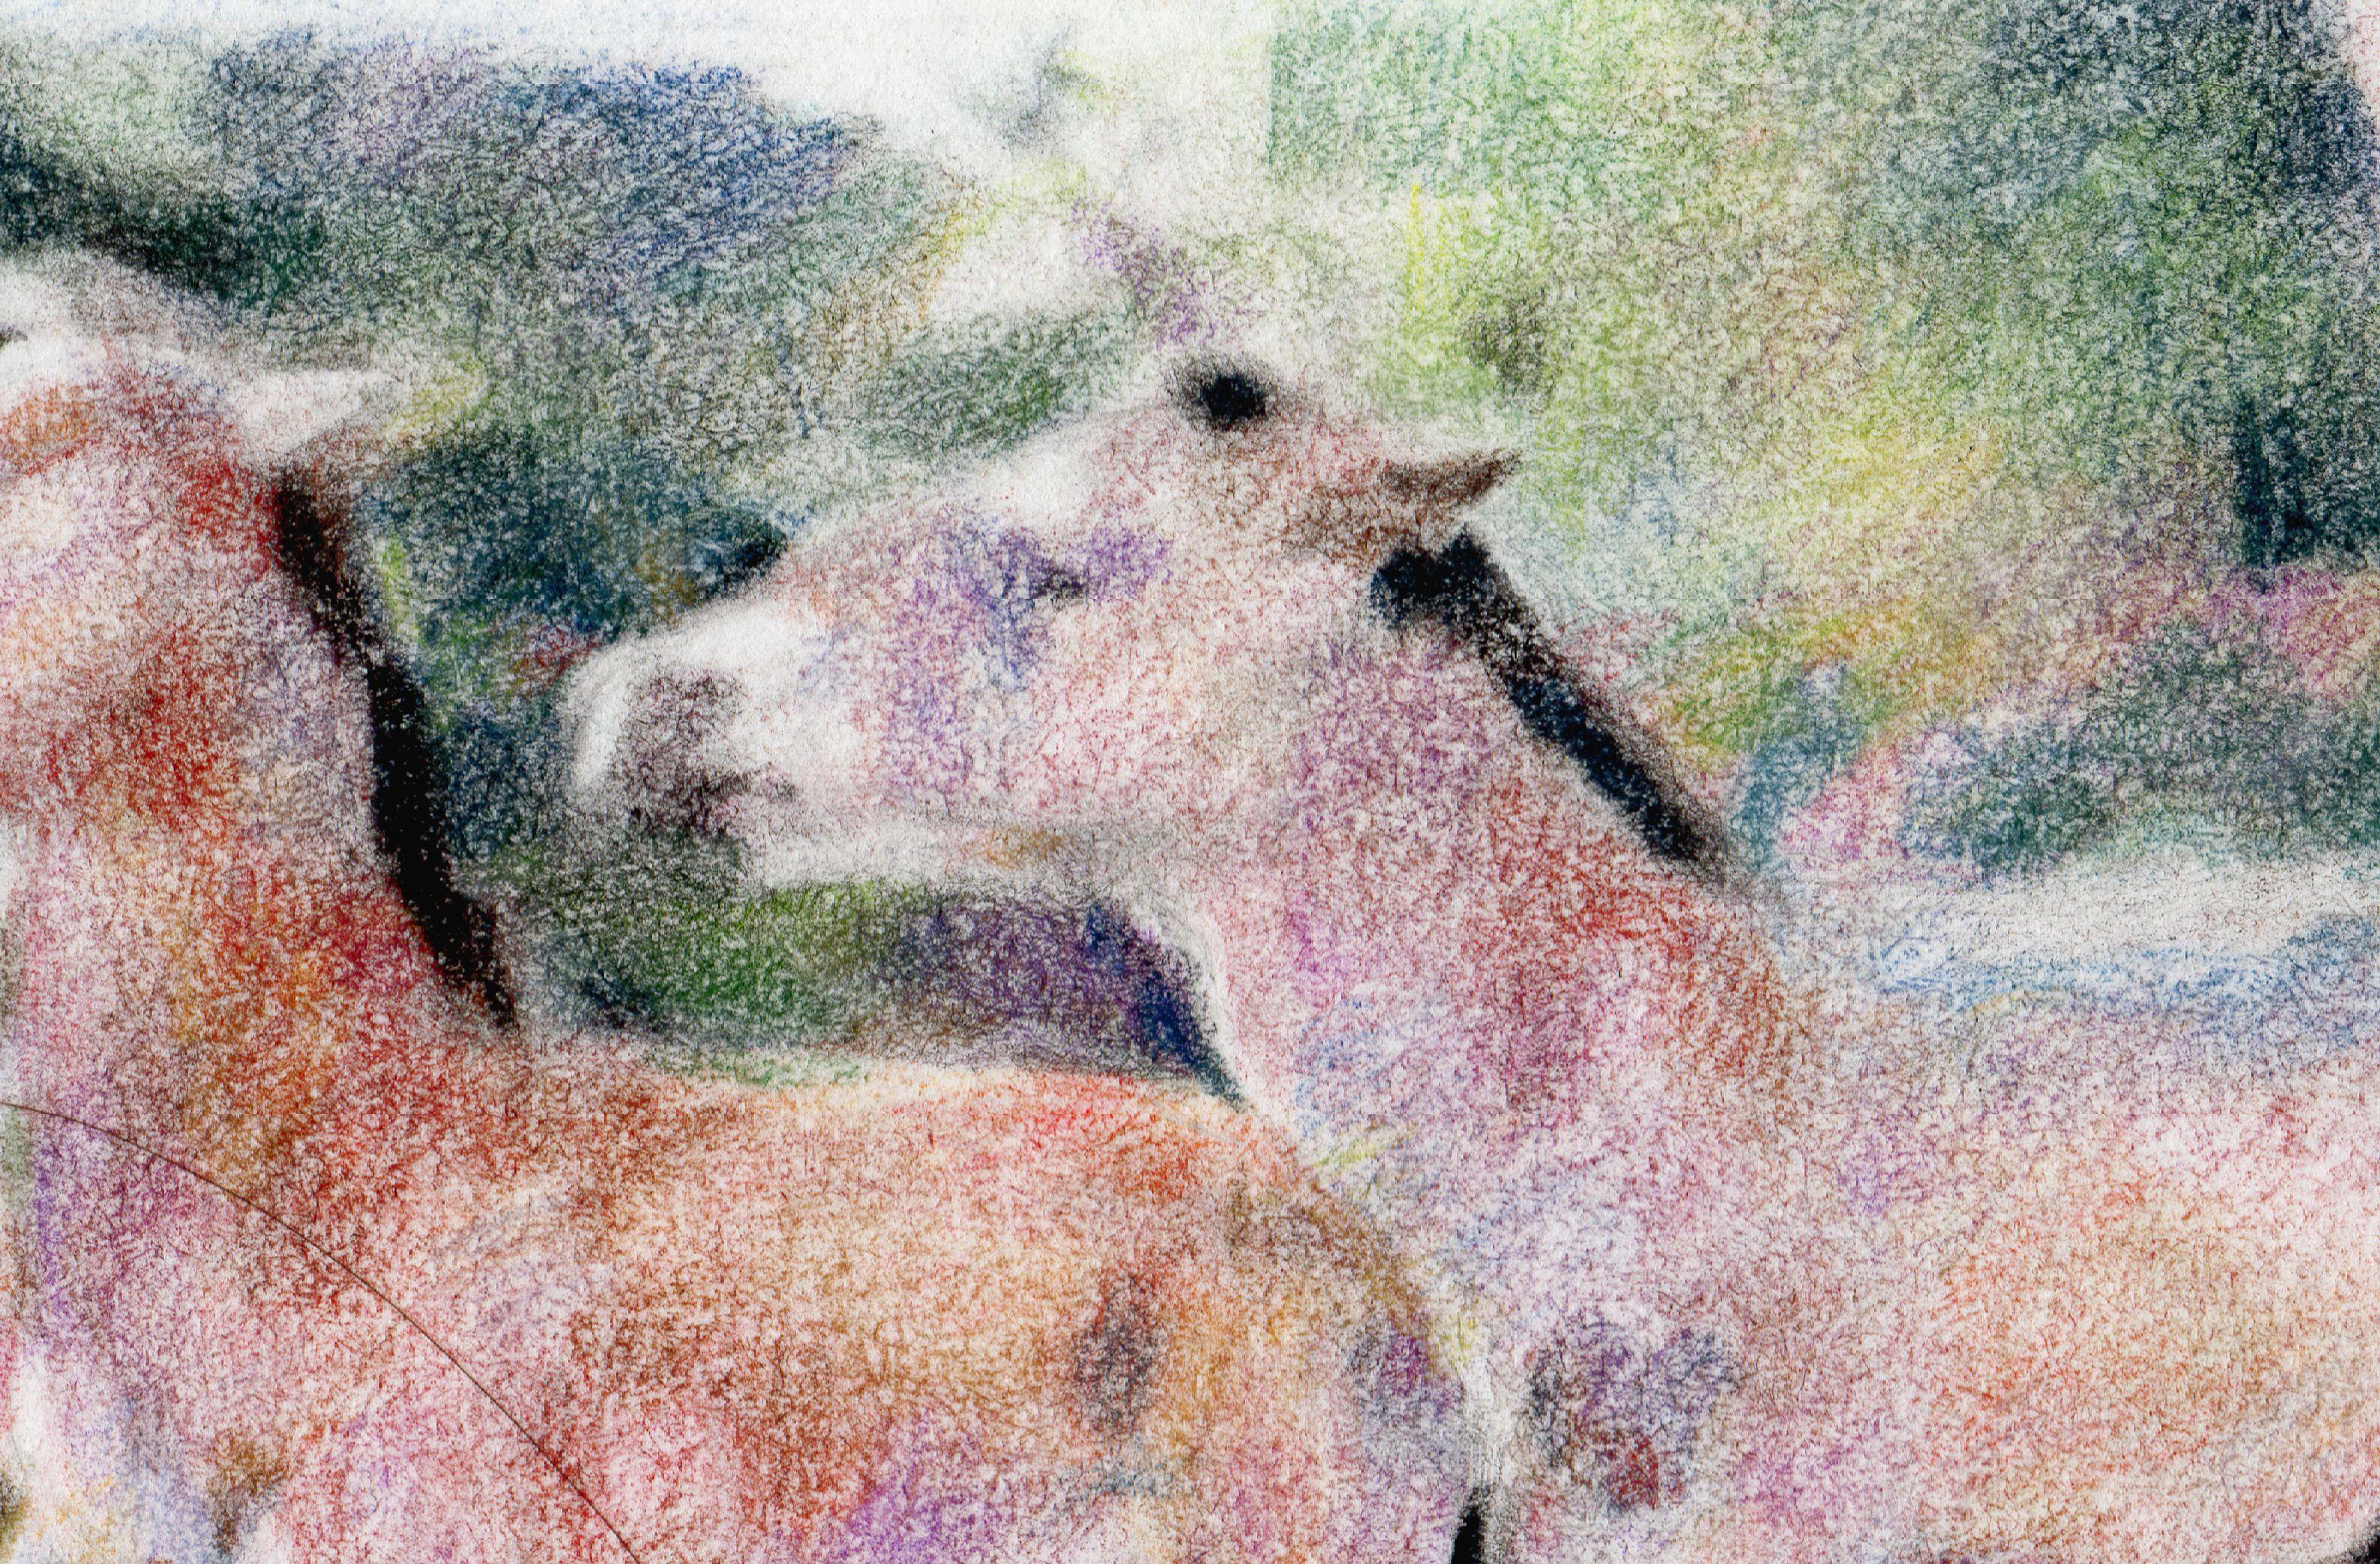 baby art soft illustration picture pastel dry original horses drawing visual peaceful rainbow positive child nursary foal